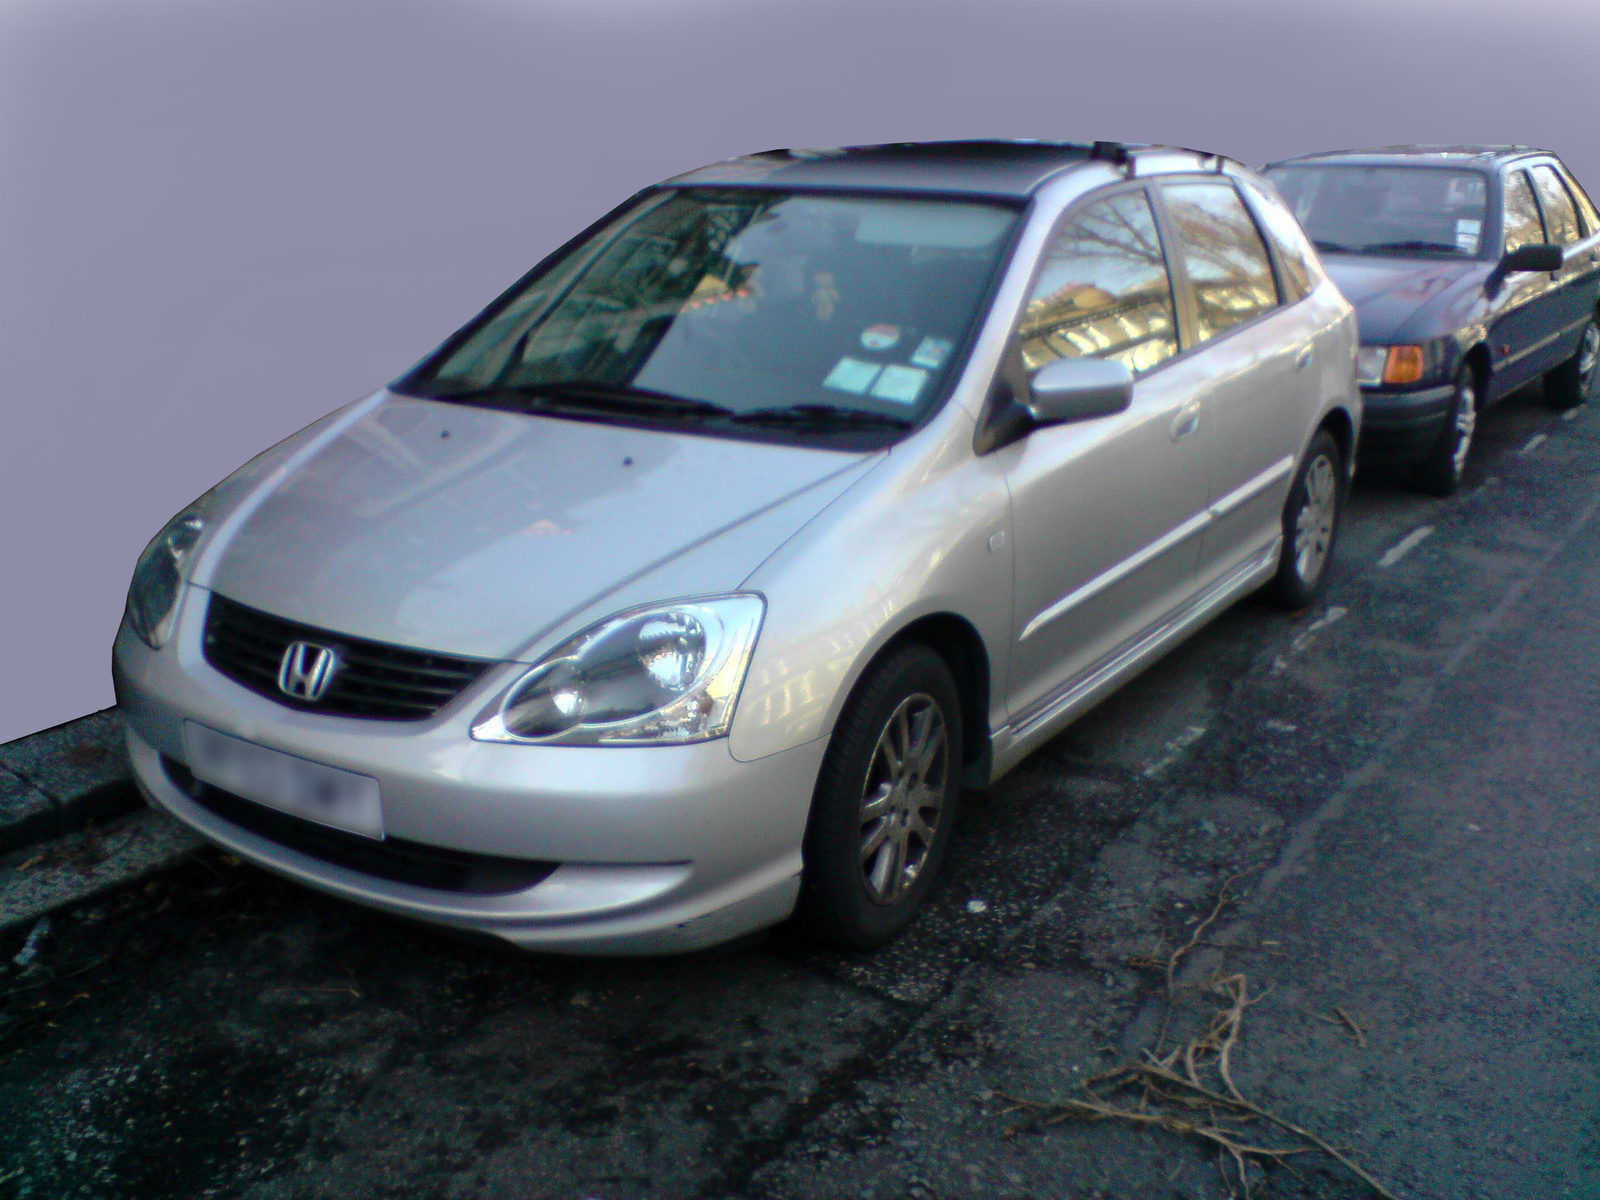 2003 Civic hatchback honda si